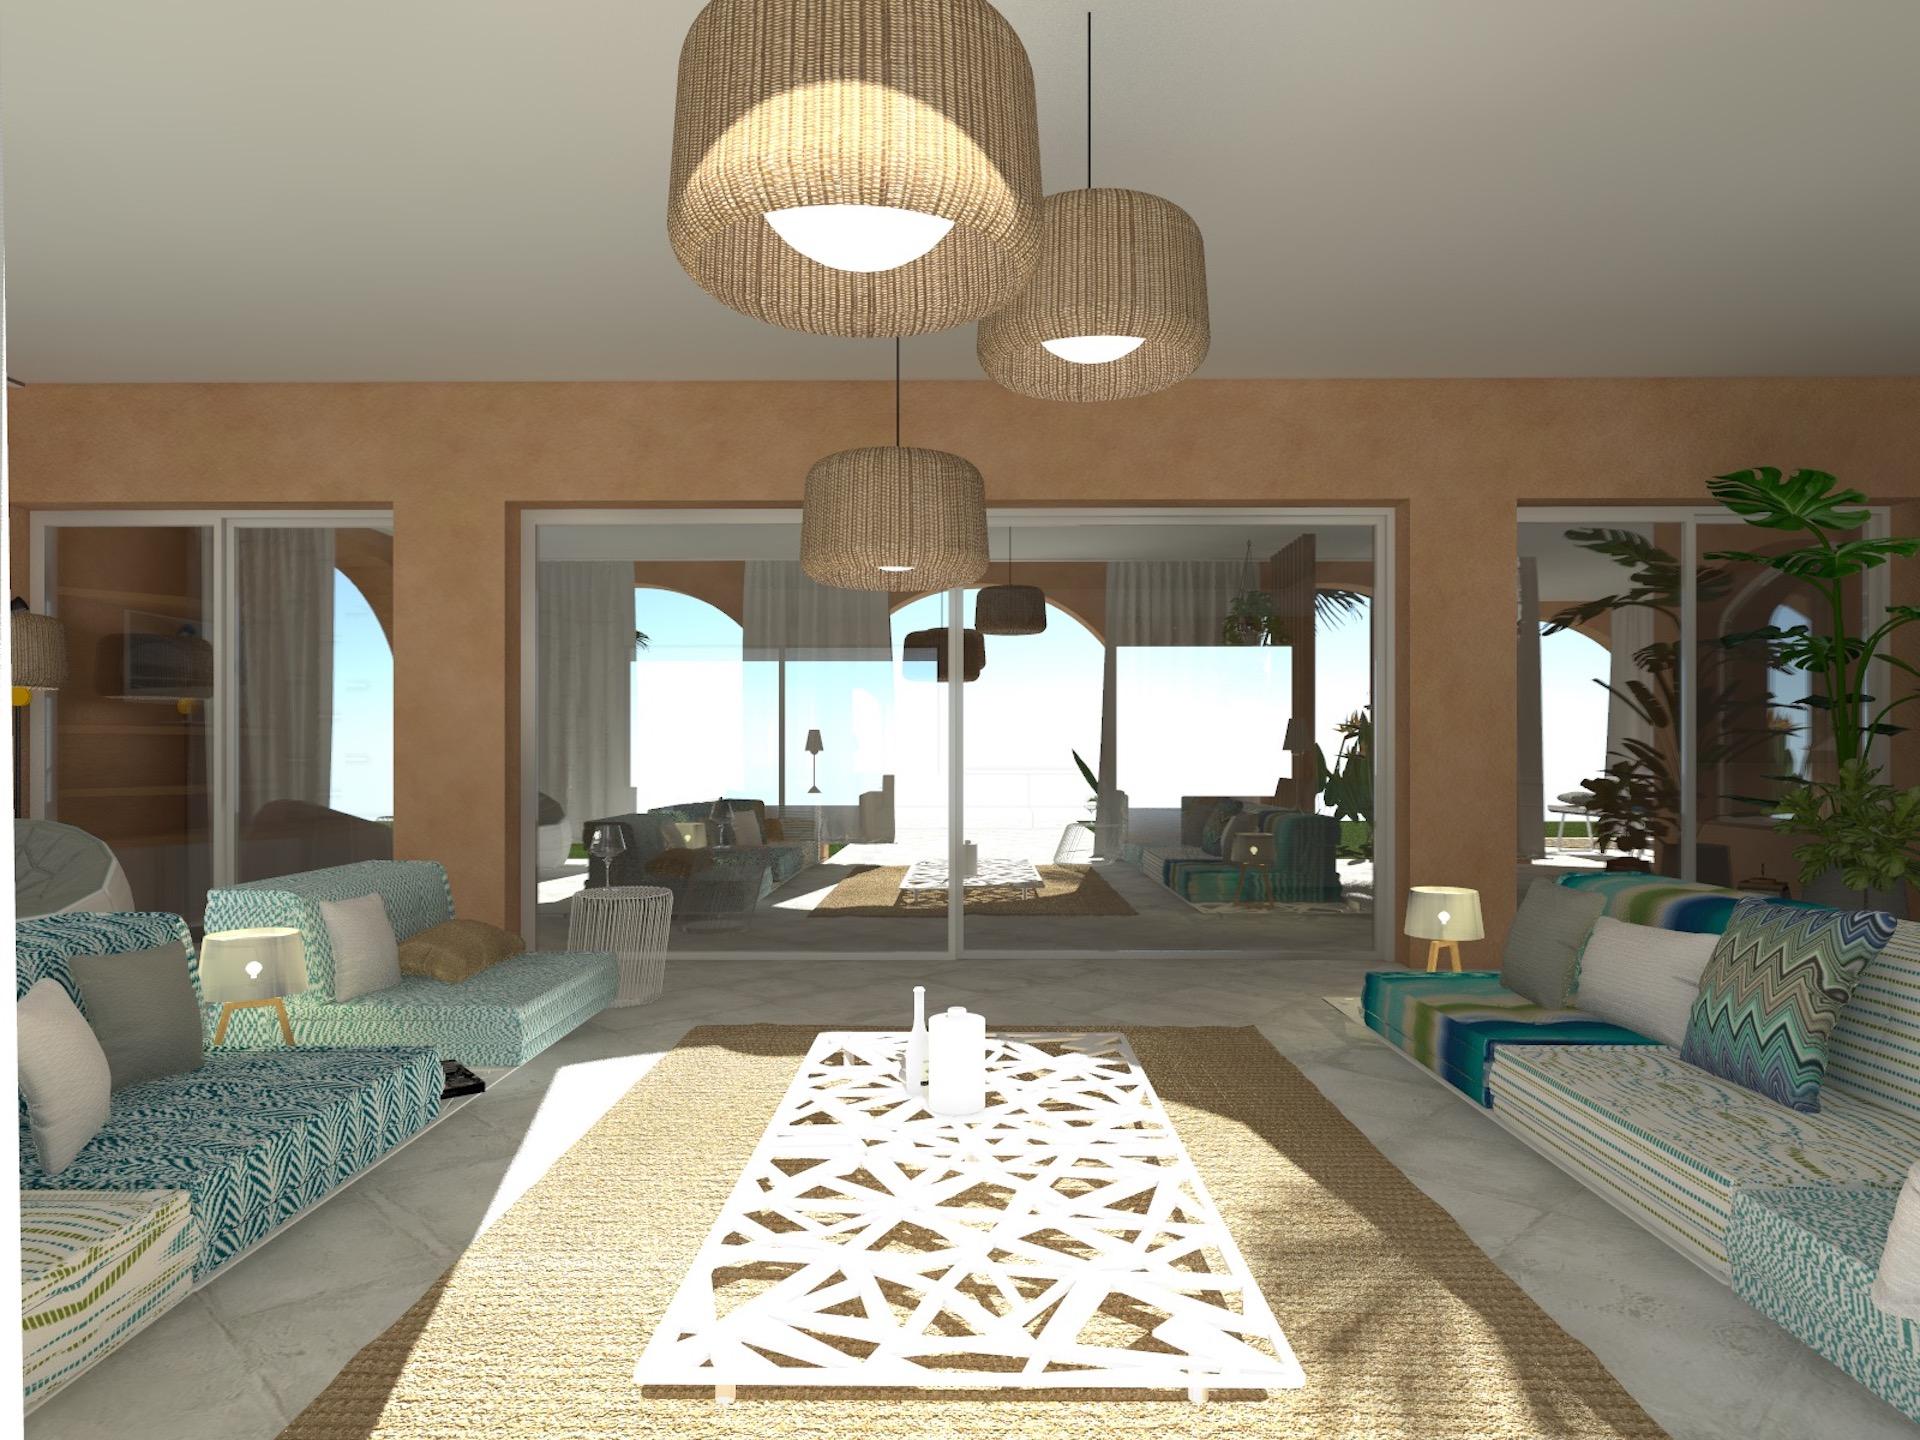 renovation villa luxe semaphore sainte-maxime var architecture interieure27